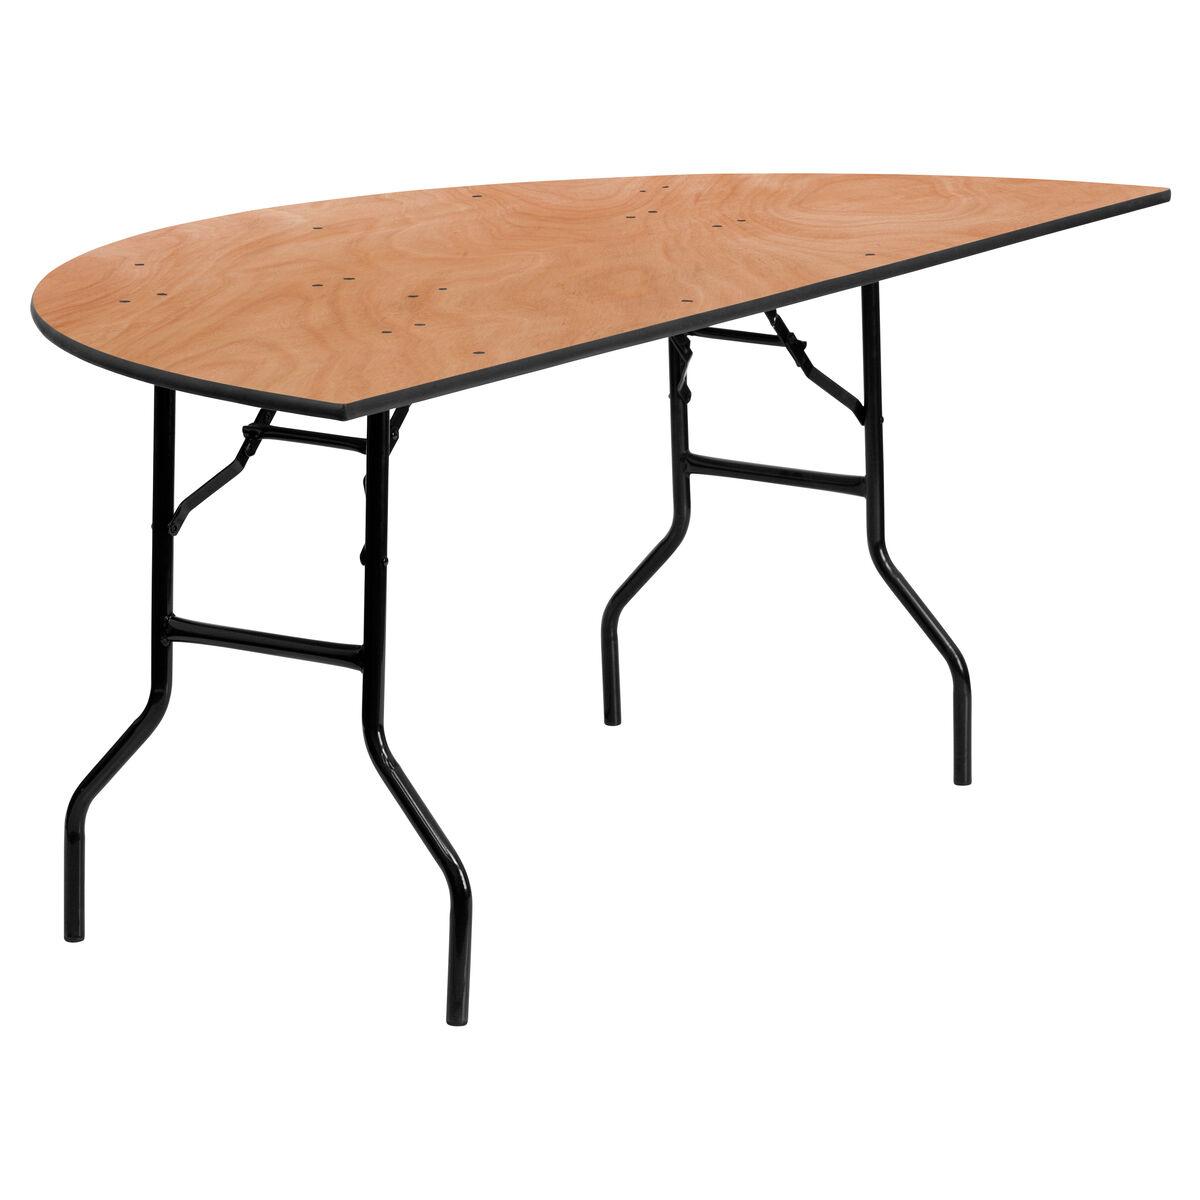 72hlf Rd Wood Fold Table Yt Whrft72 Hf Gg